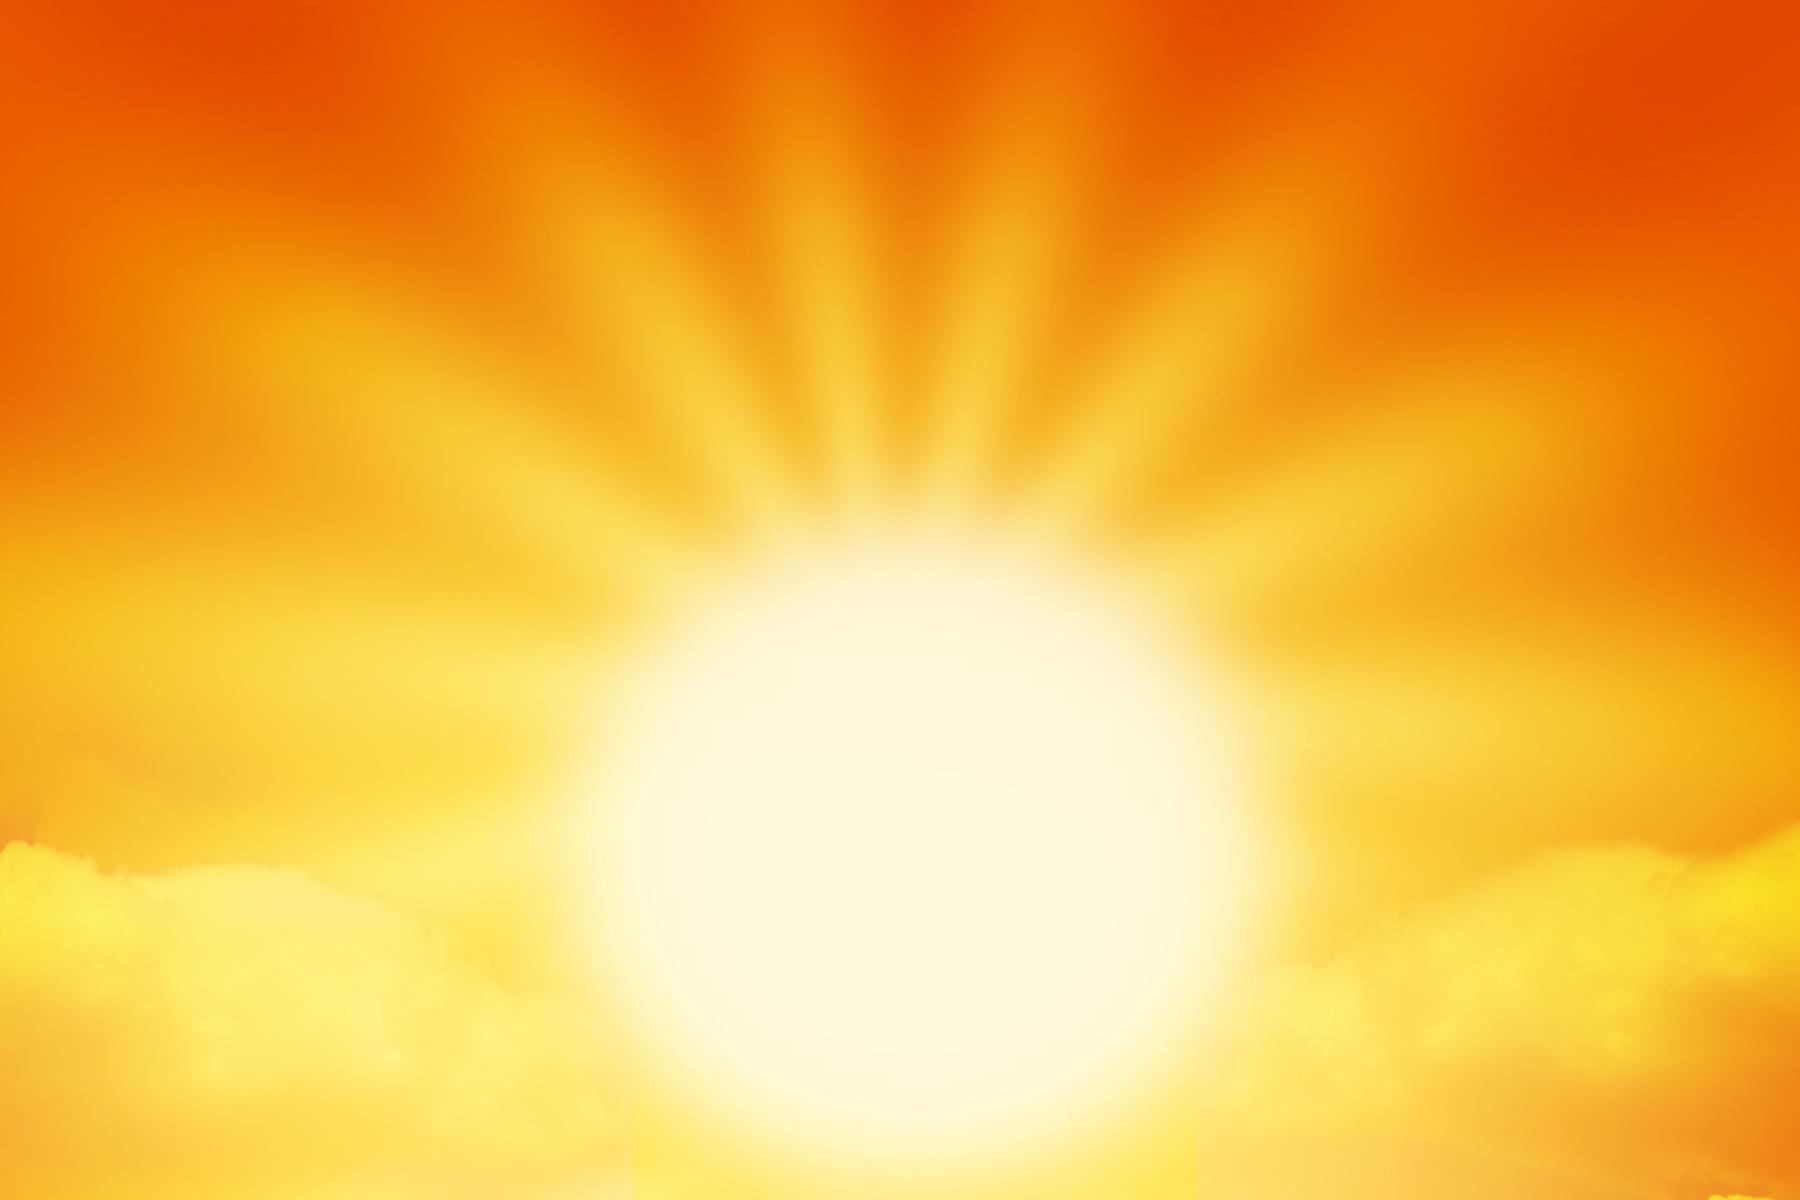 photo of the sun